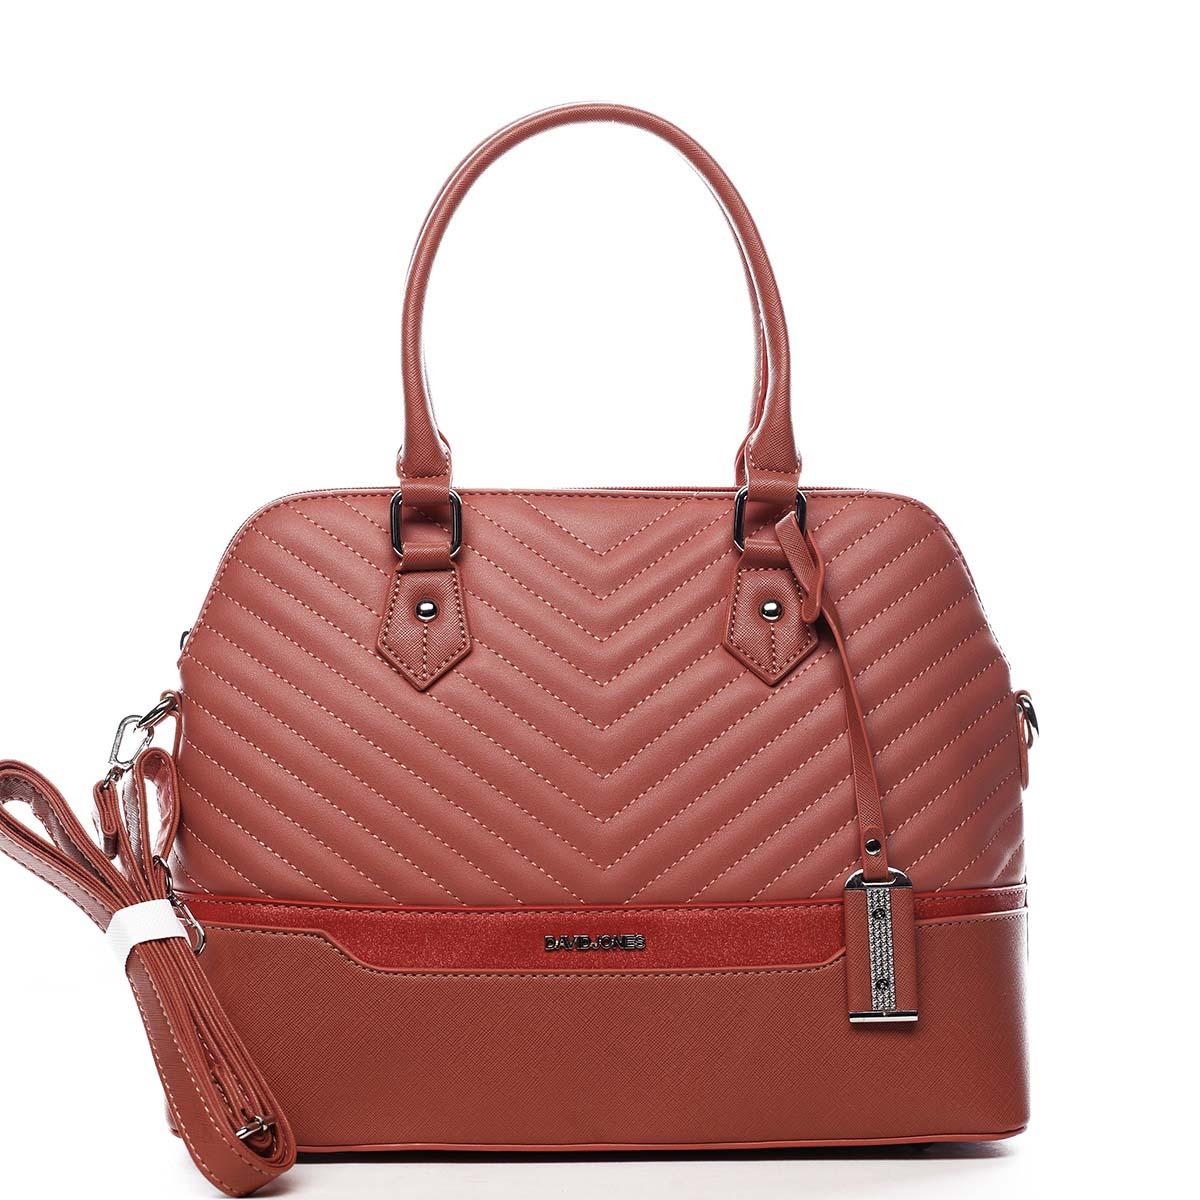 Dámská kabelka do ruky růžová - David Jones Roshel